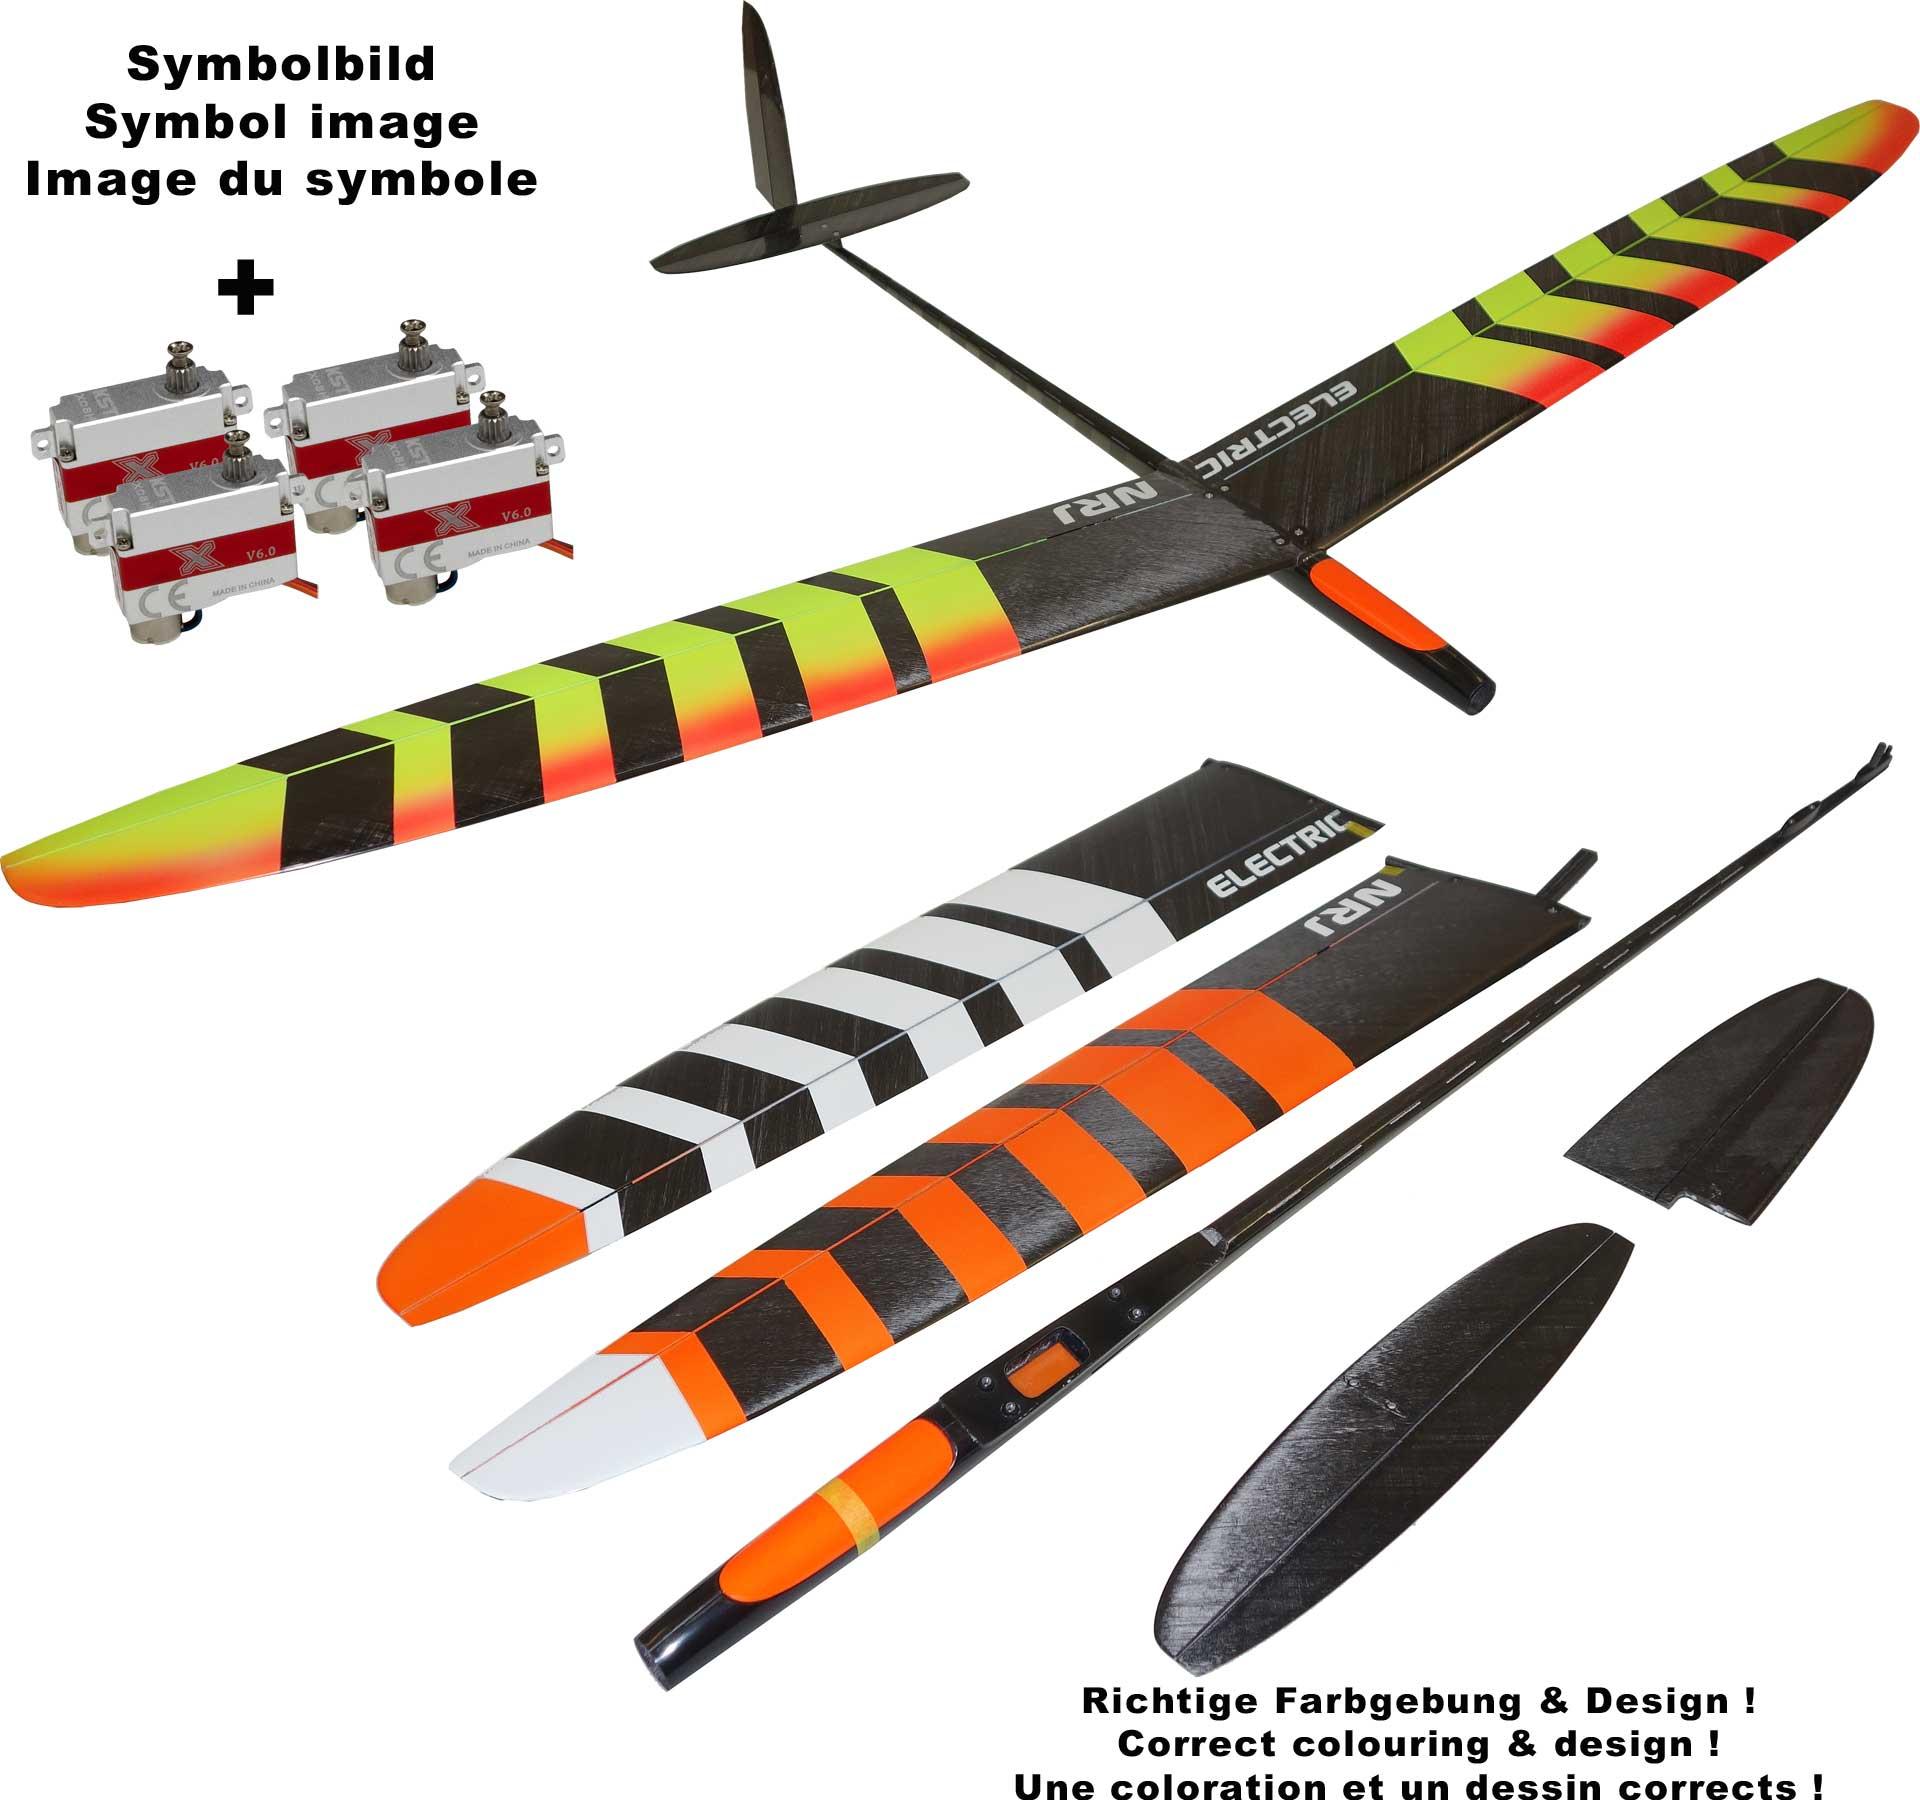 OA-Composites NRJ F5K Electric + KST X08H Servosset Farbe # B Weiss/orange